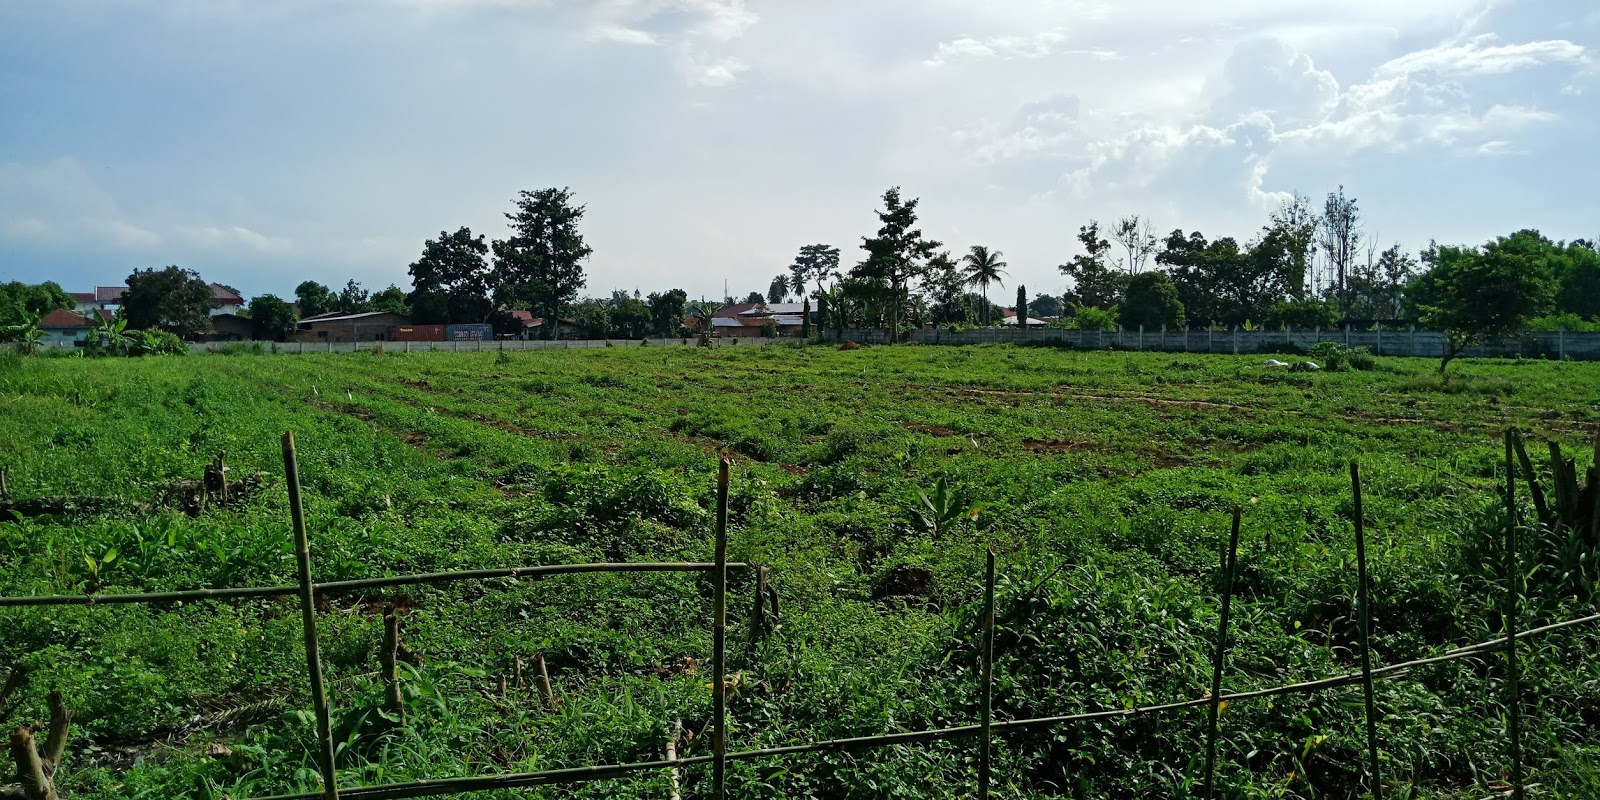 Dijual Tanah Kosong Di Jl Rasmi Madirsan Samping Tol ...